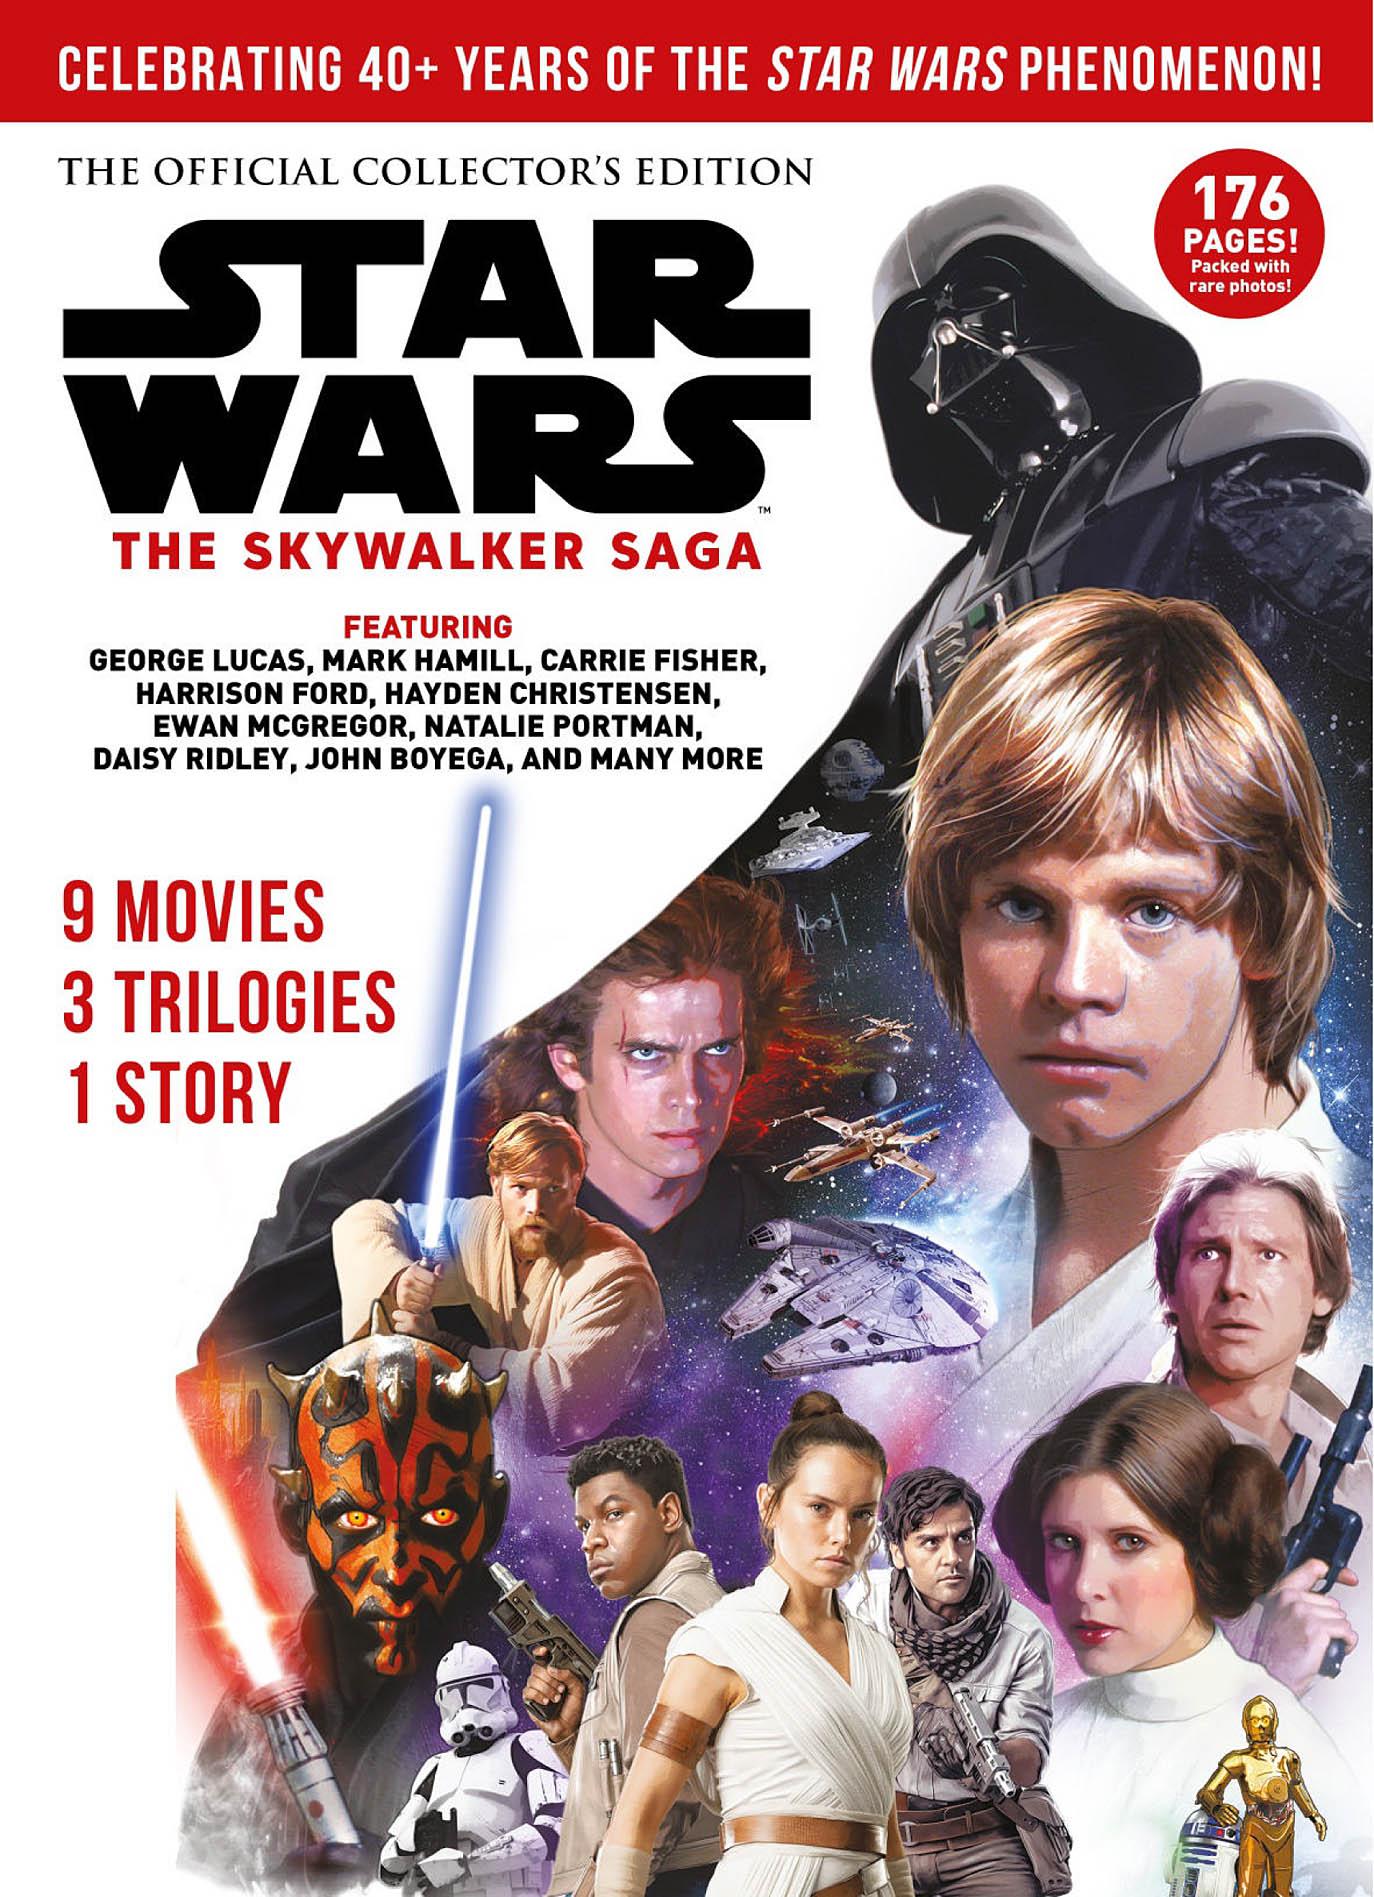 Star Wars - The Skywalker Saga 2021.jpg